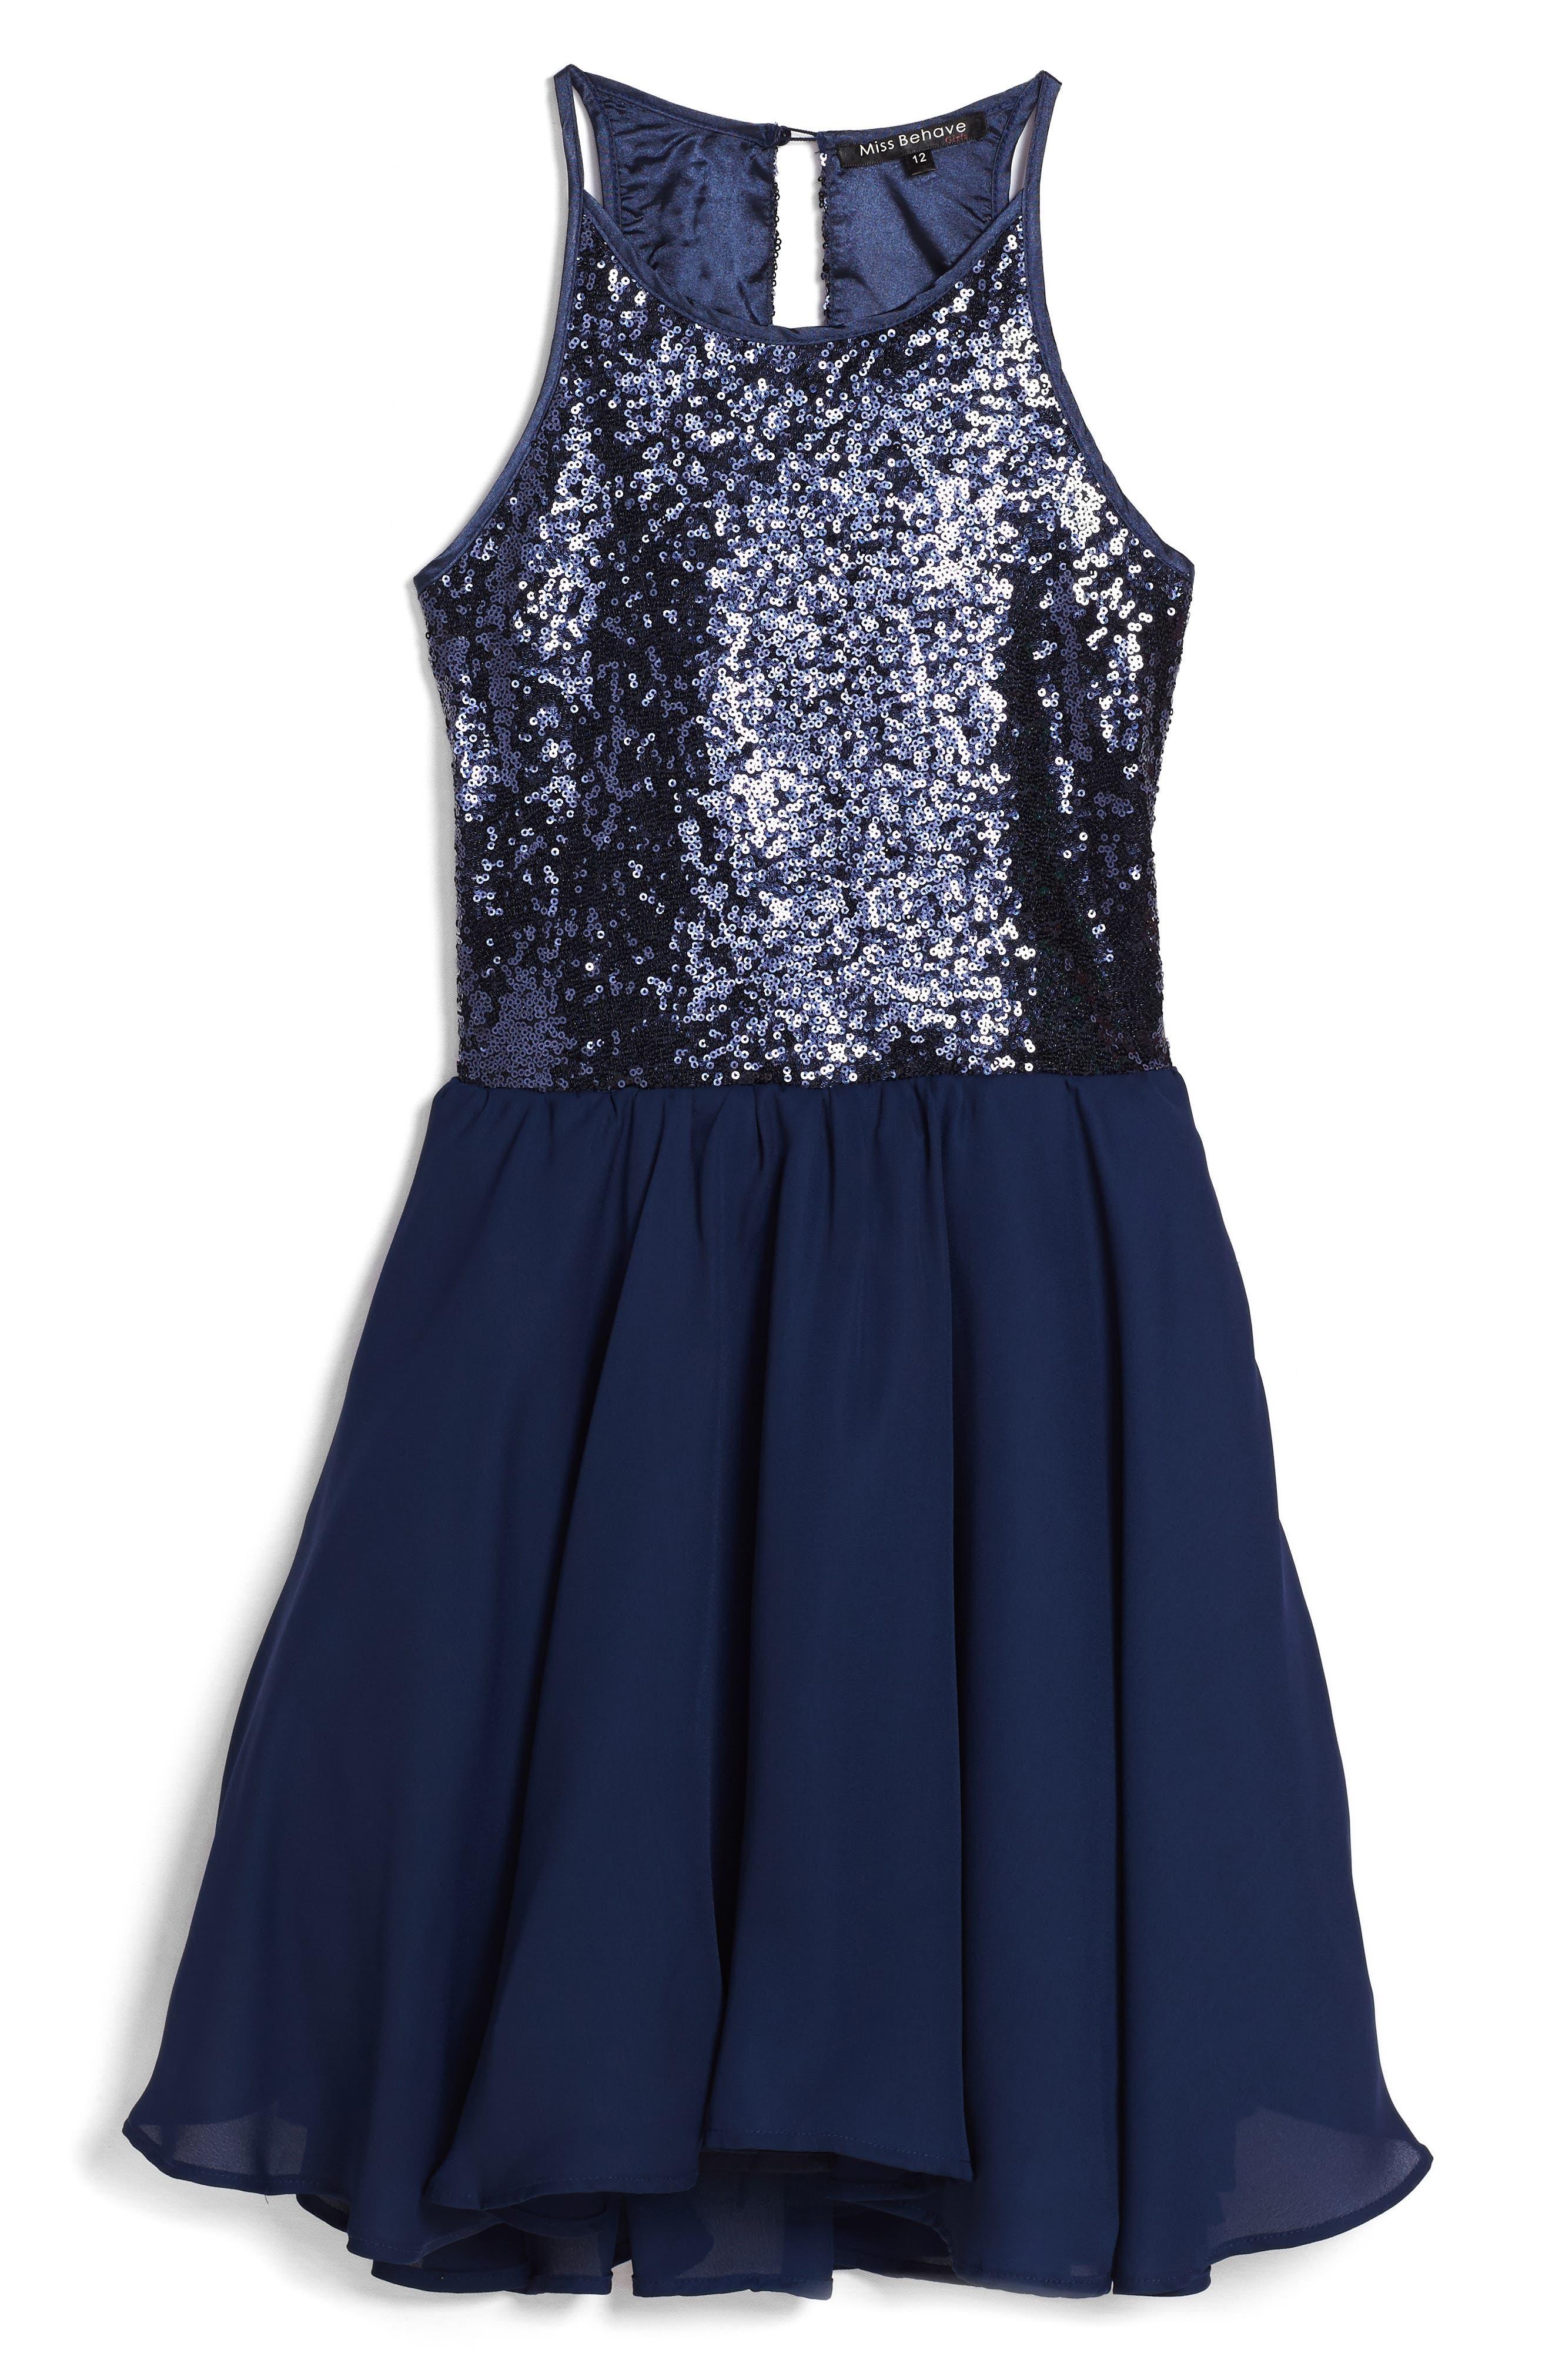 Main Image - Miss Behave Josie Sequin Bodice Chiffon Dress (Big Girls)